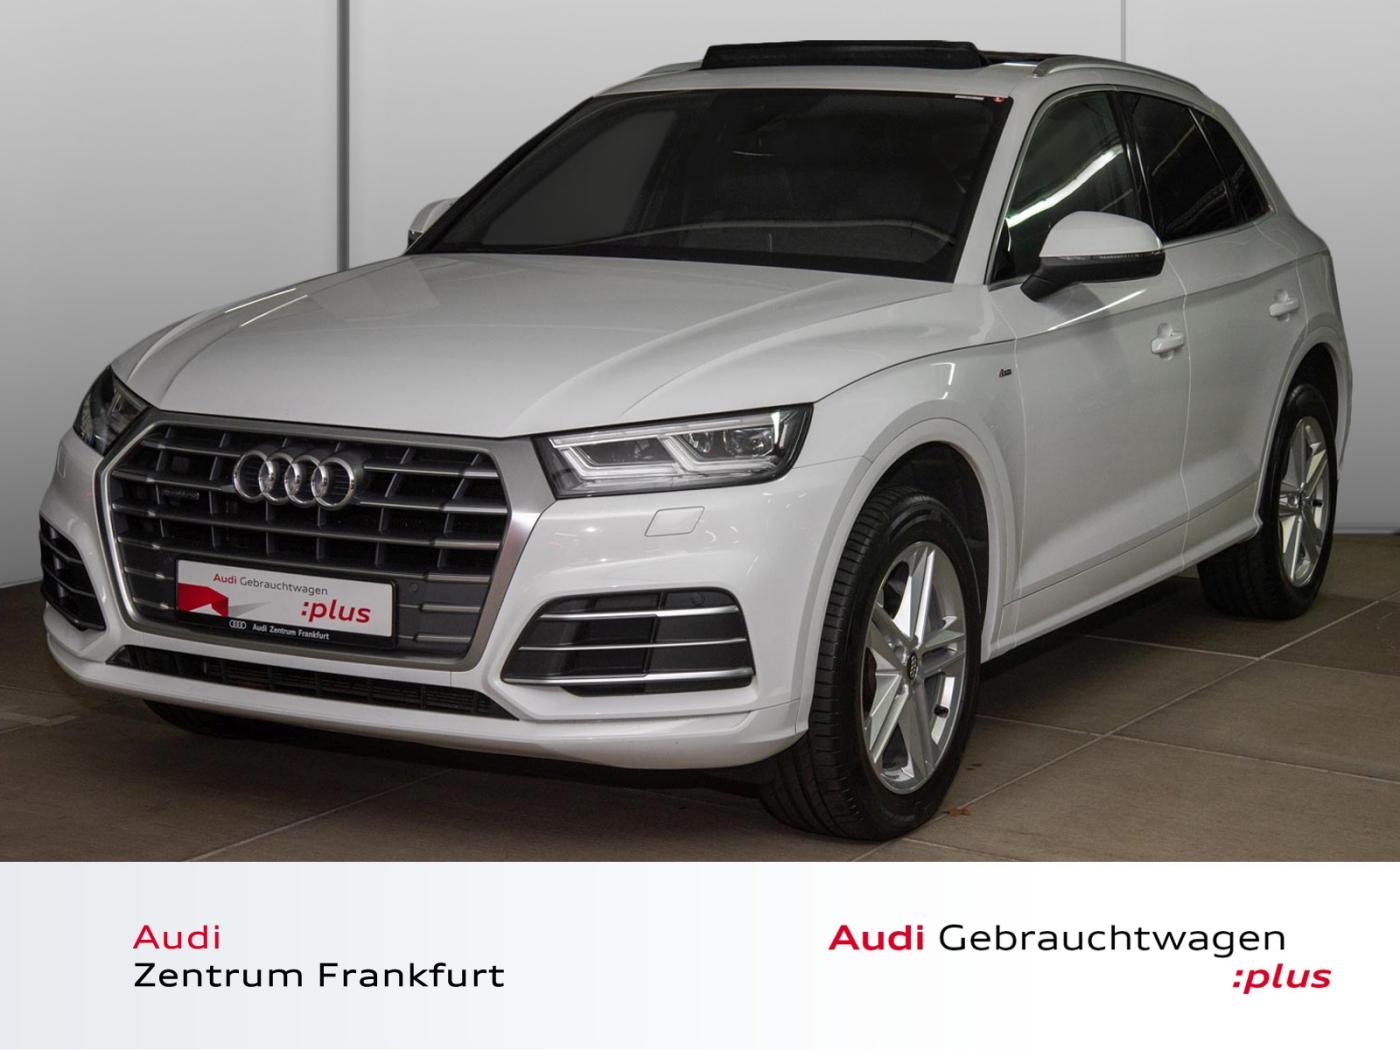 Audi Q5 2.0 TDI quattro S tronic S line Matrix-LED Pa, Jahr 2017, Diesel